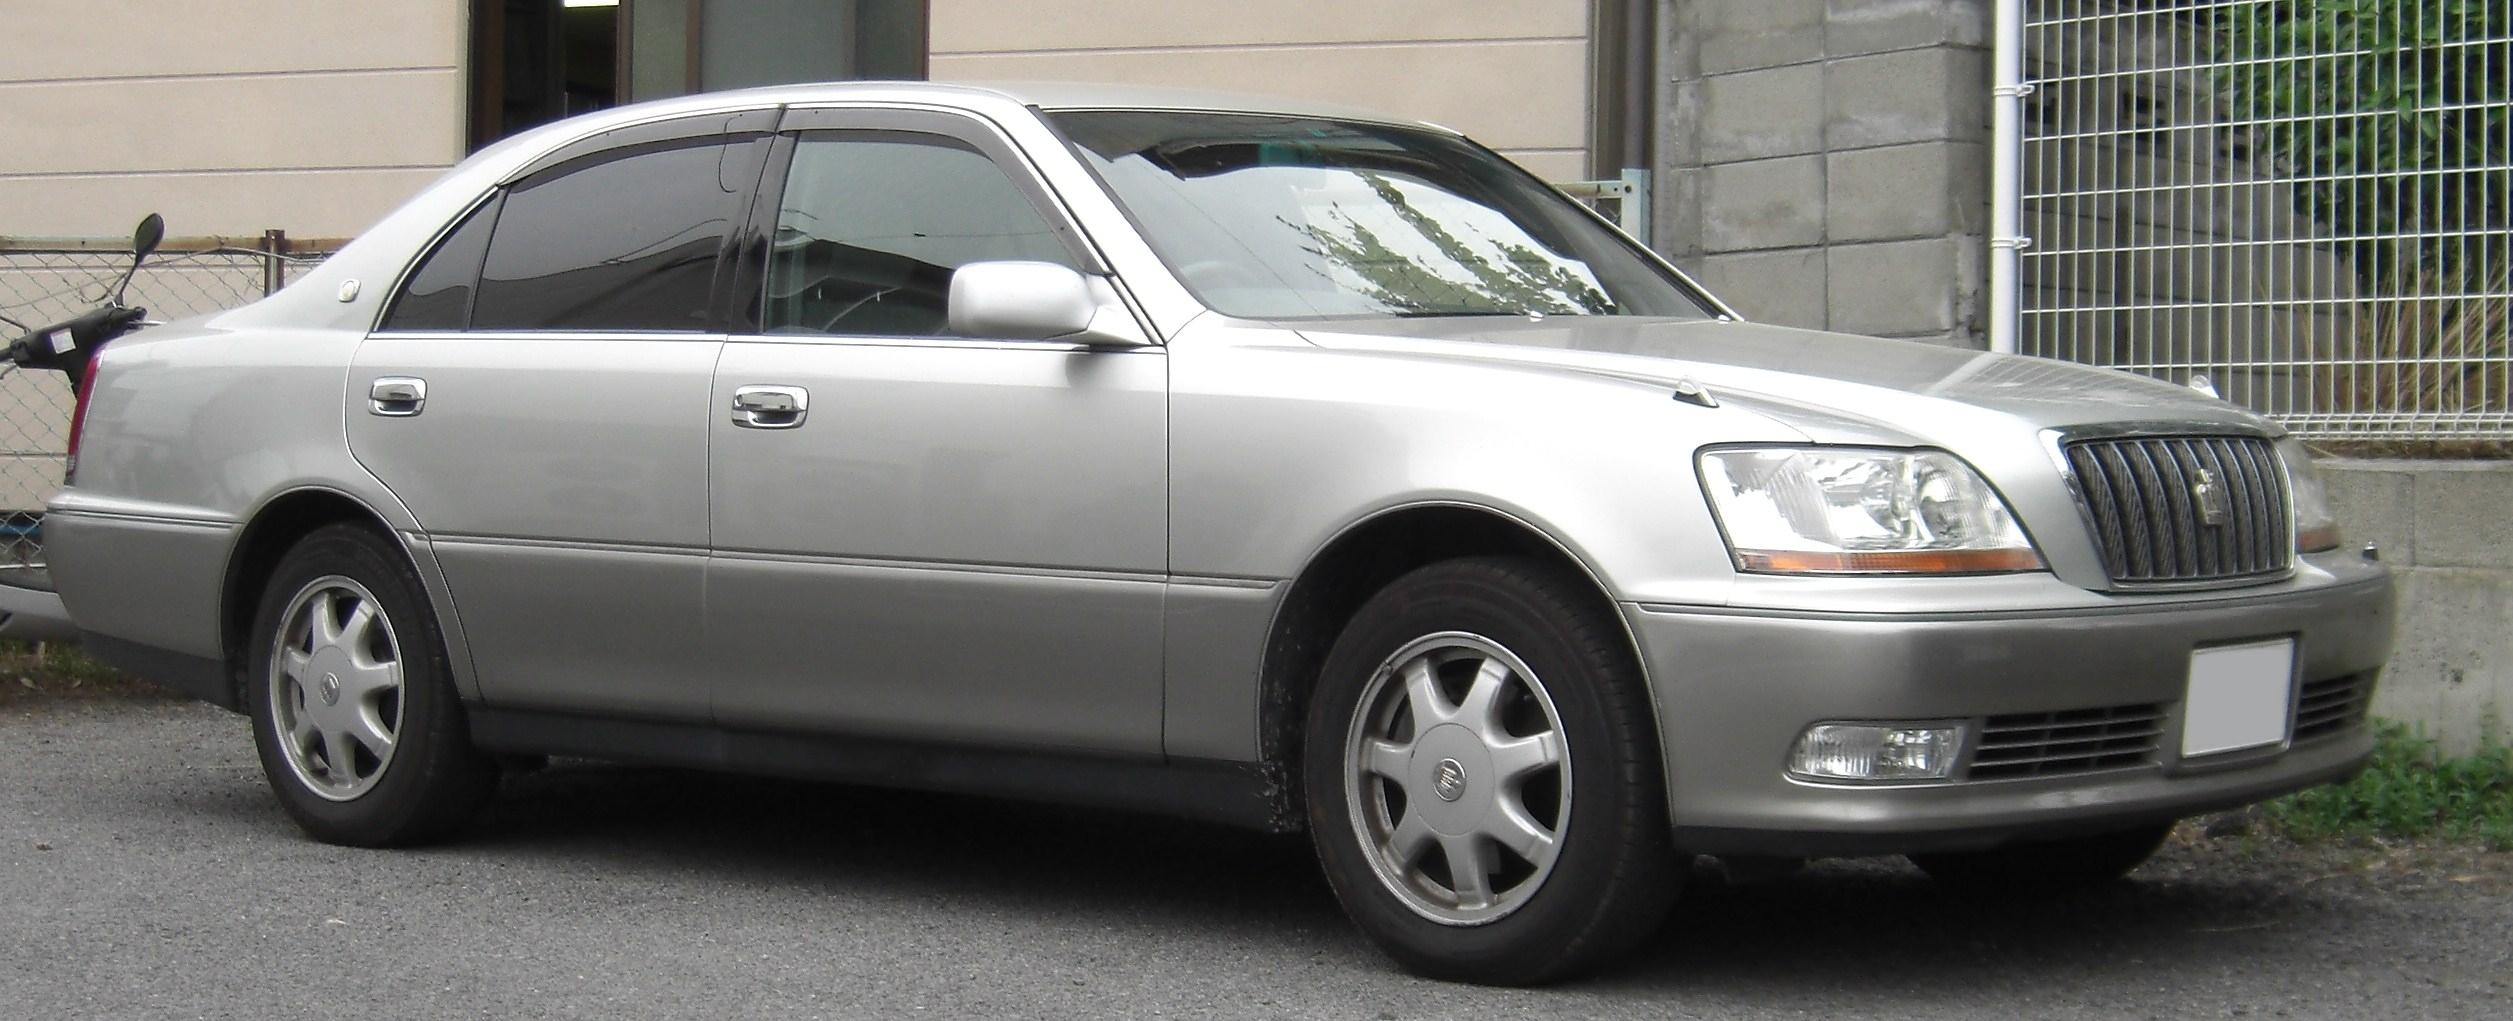 Description Toyota Crown Majesta S170.jpg